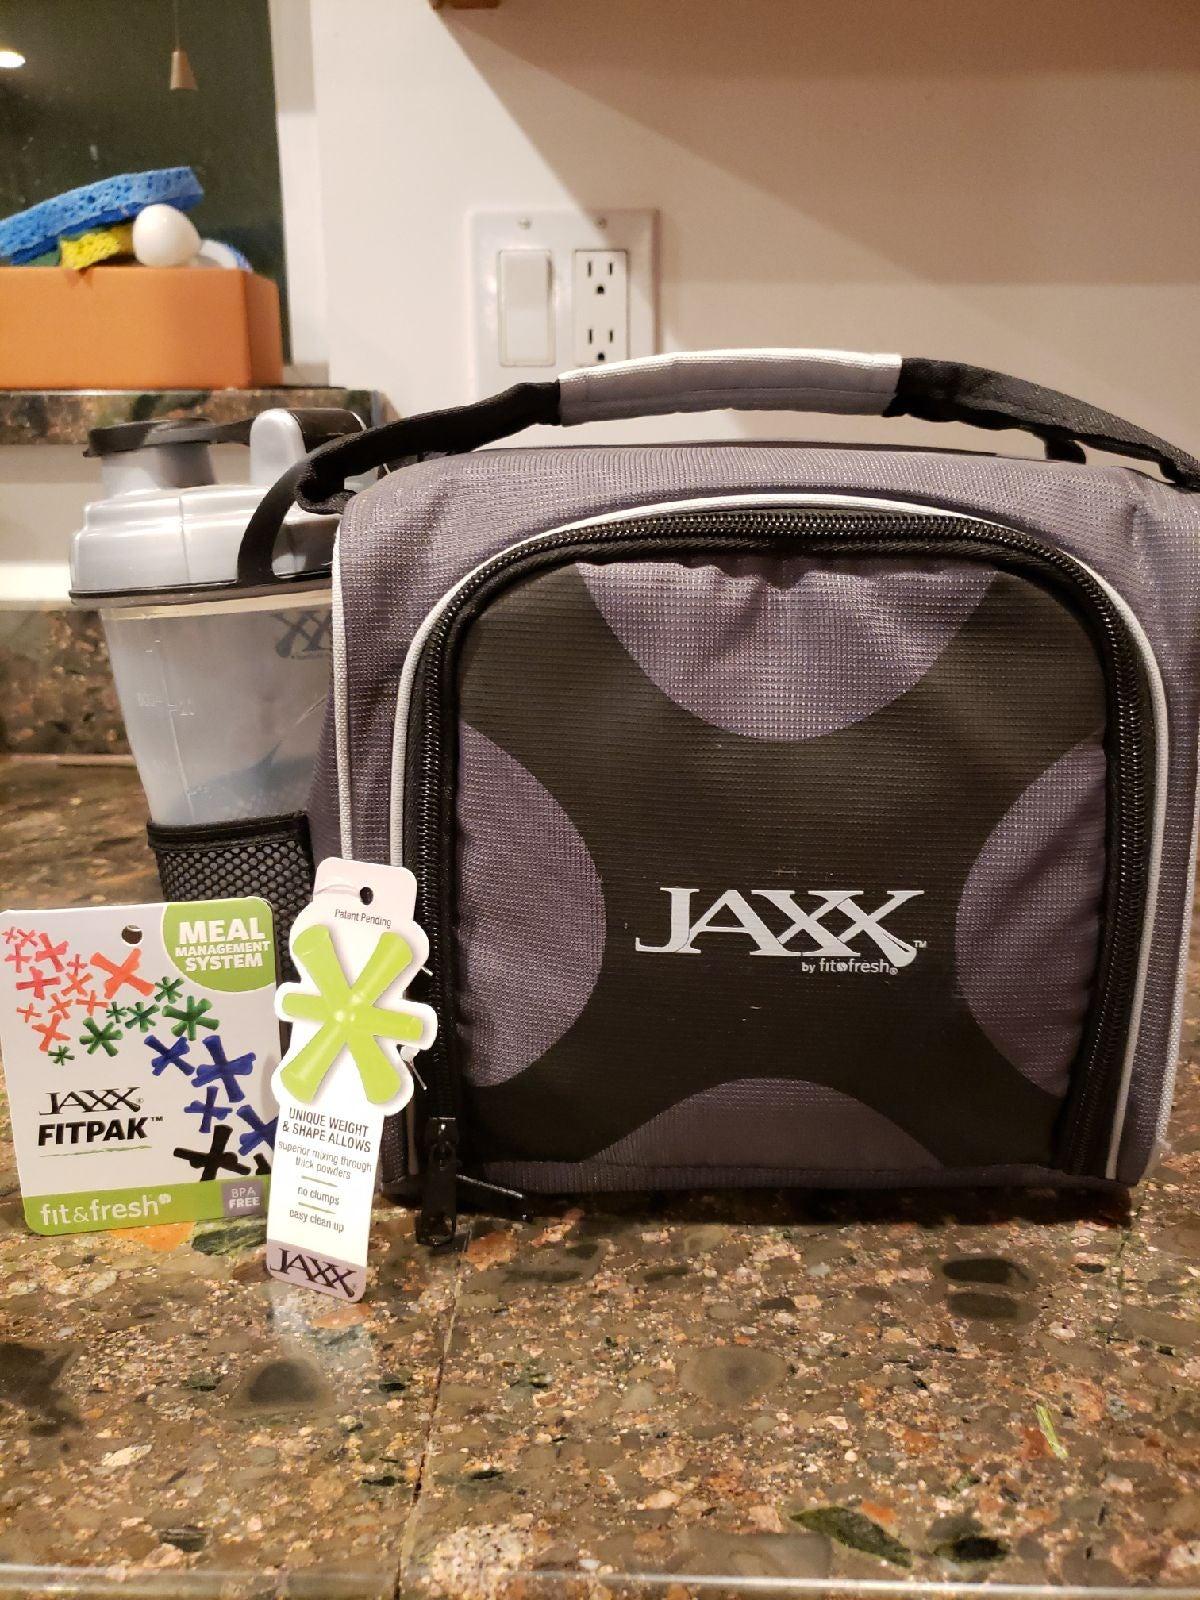 Jaxx Fitpak Meal Management System